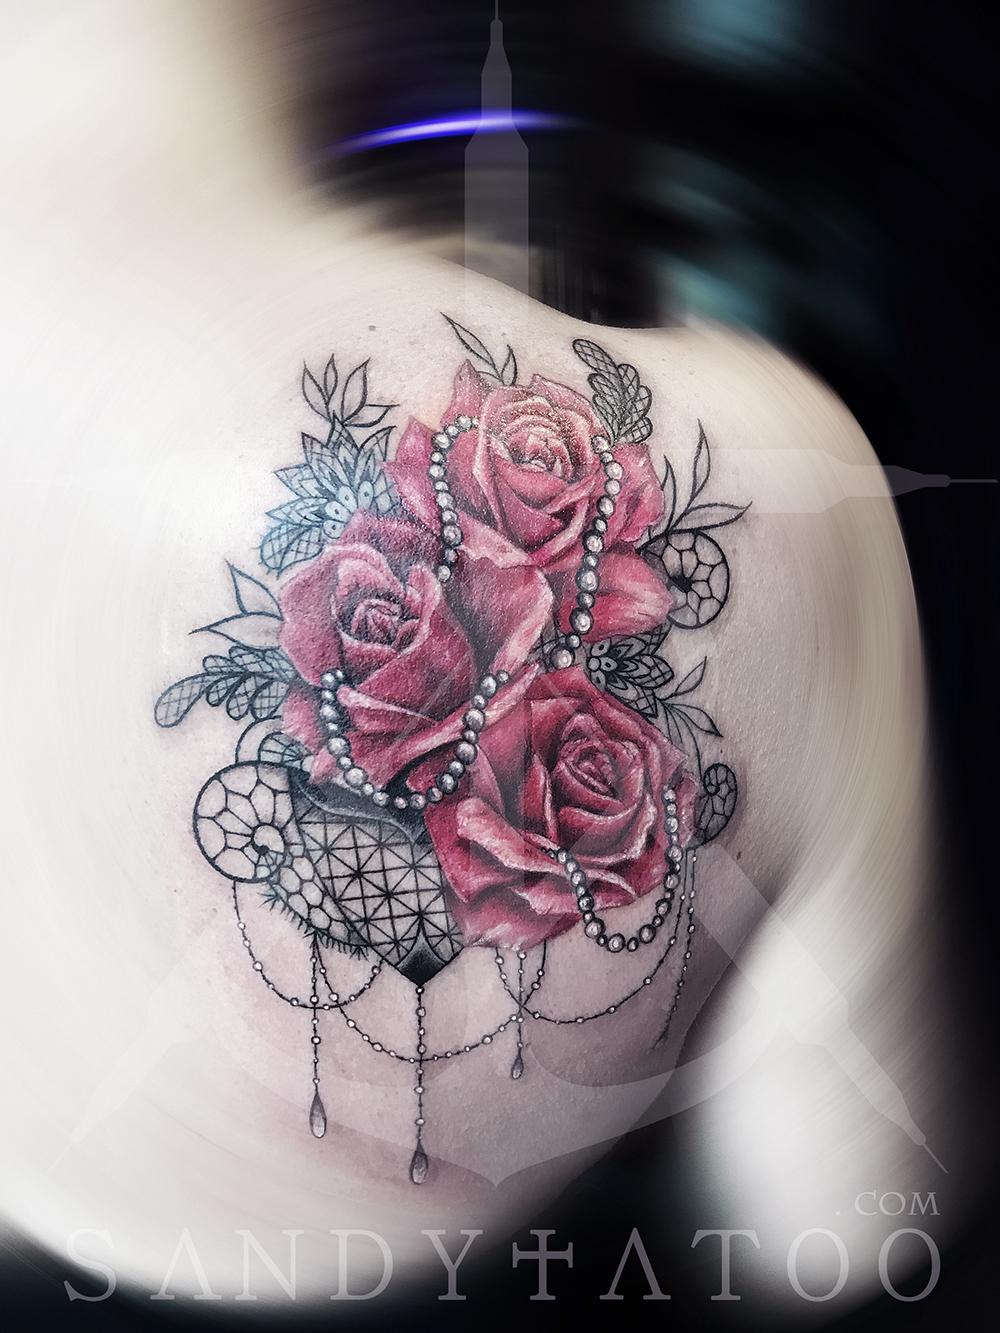 Tatouage Rose Et Dentelle Sandytatoo